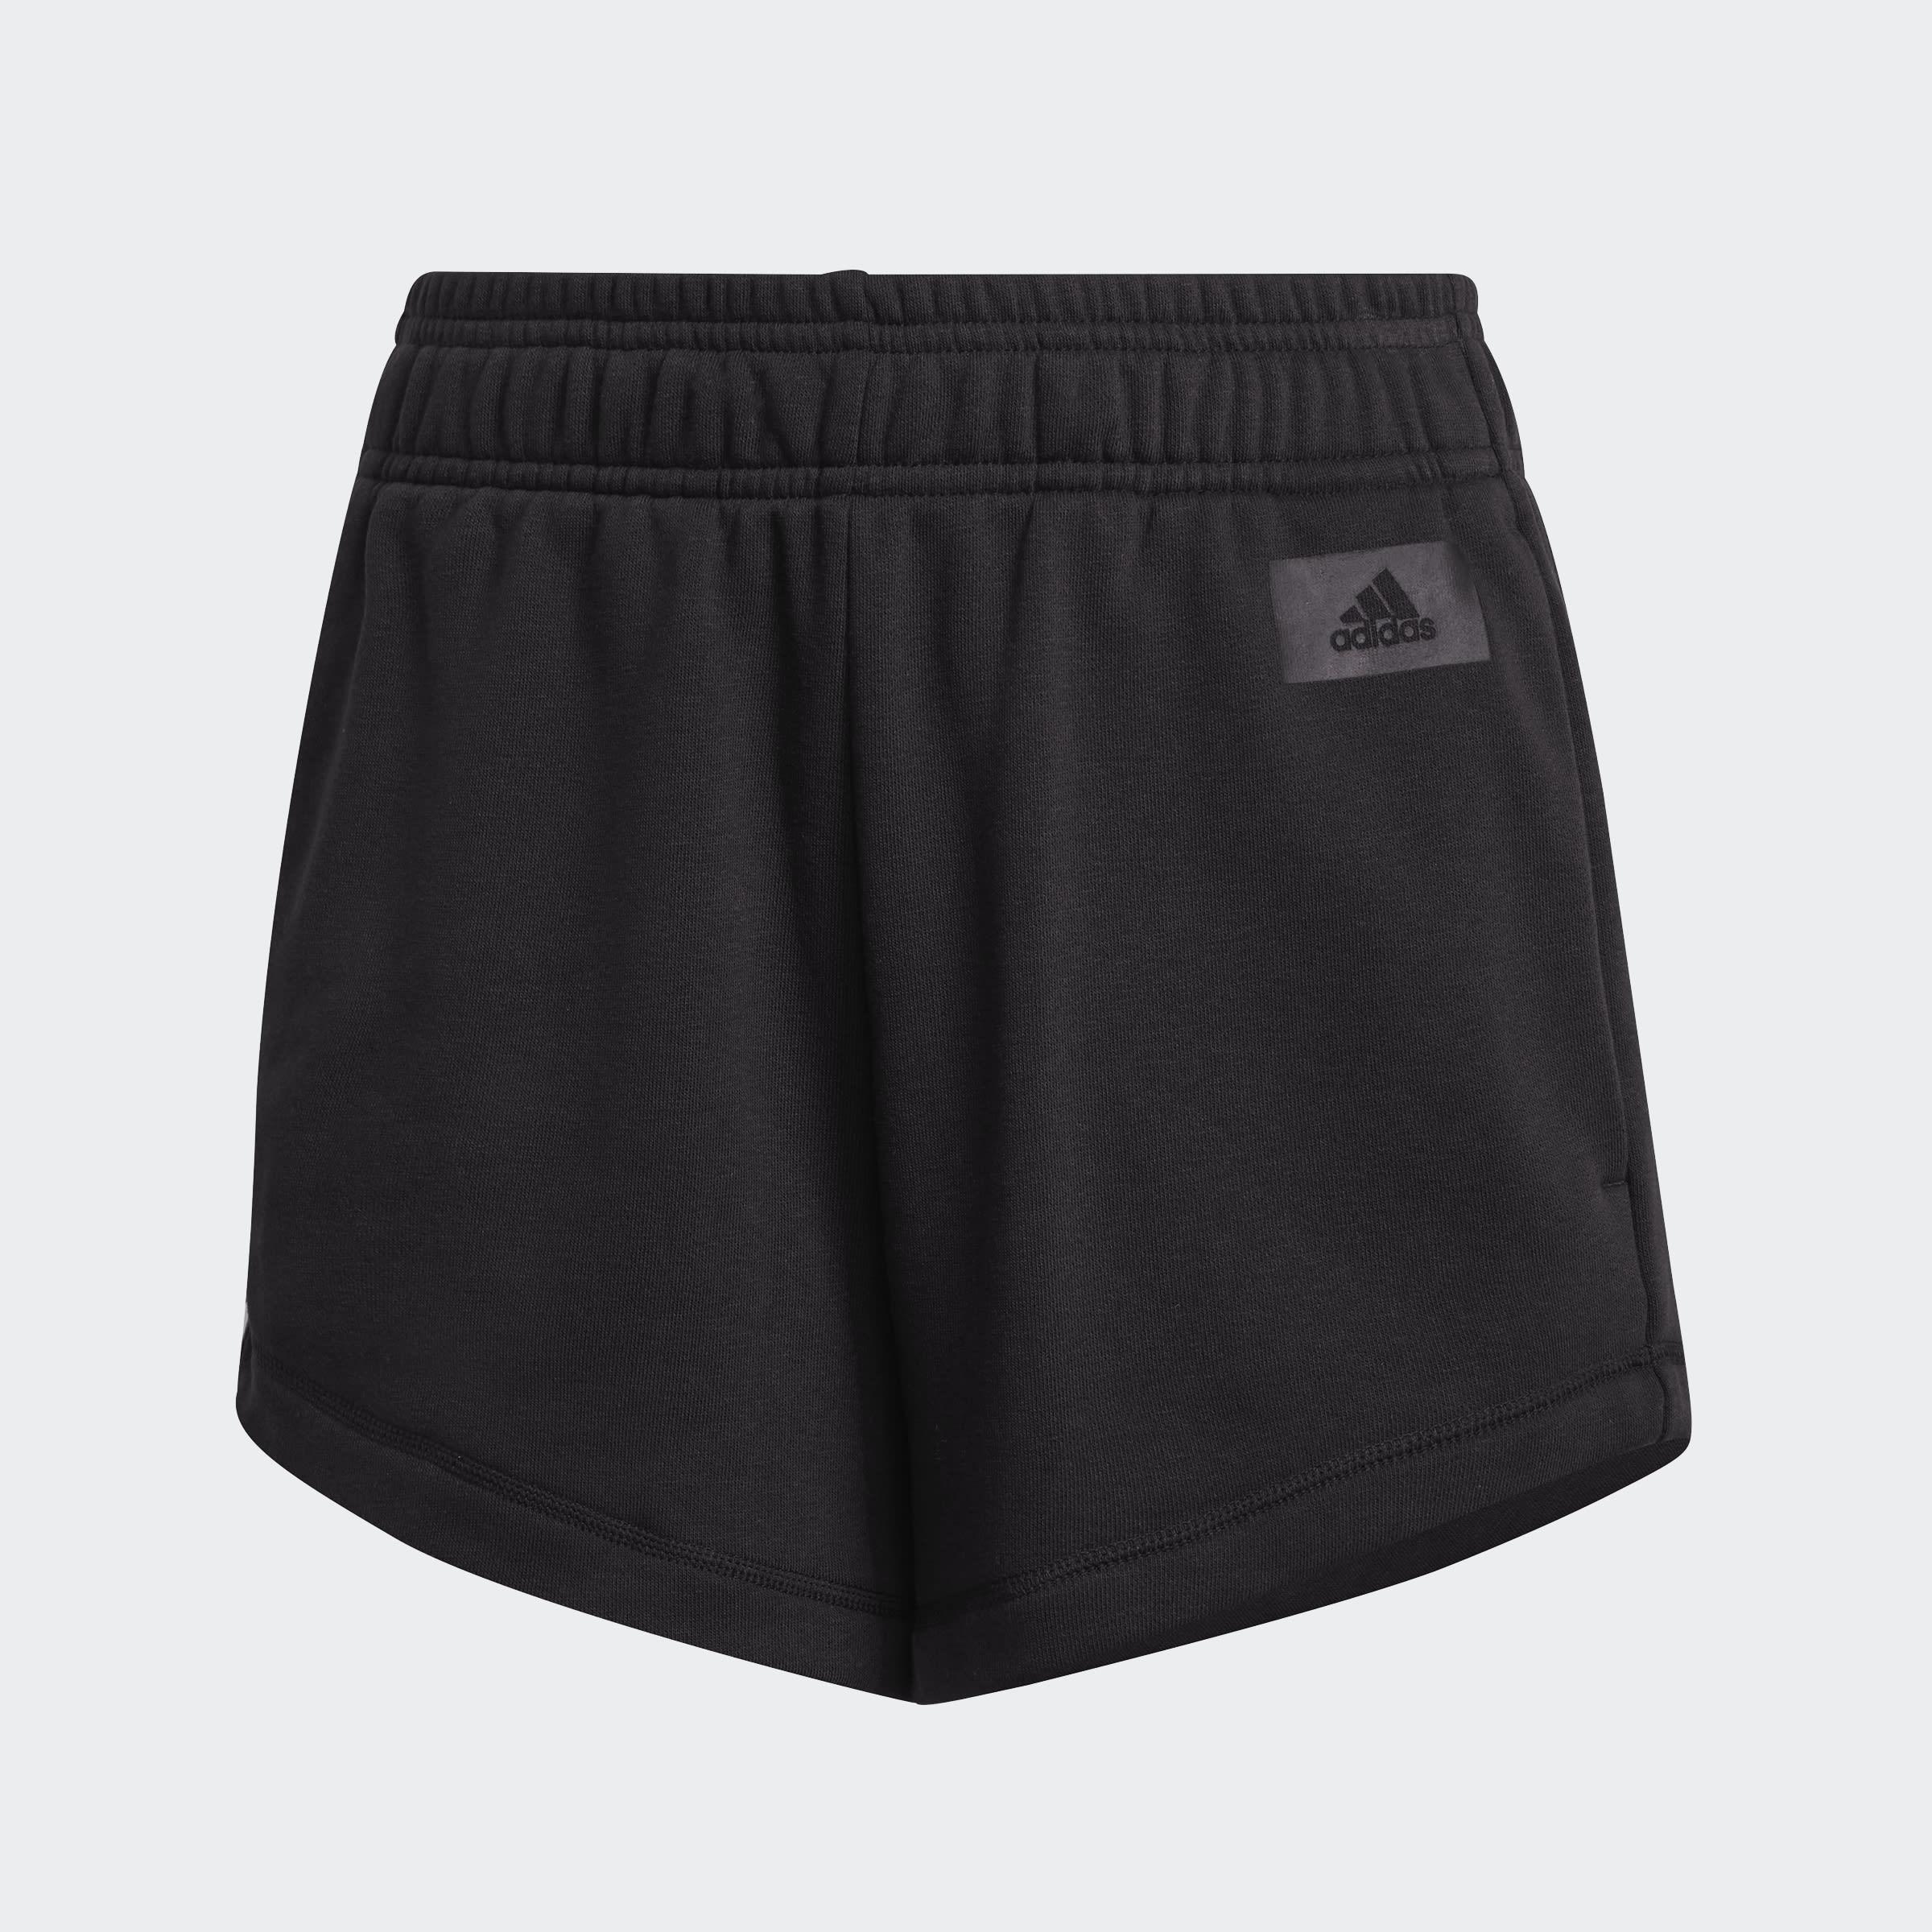 adidas performance -  Shorts ADIDAS SPORTSWEAR RECYCLED COTTON